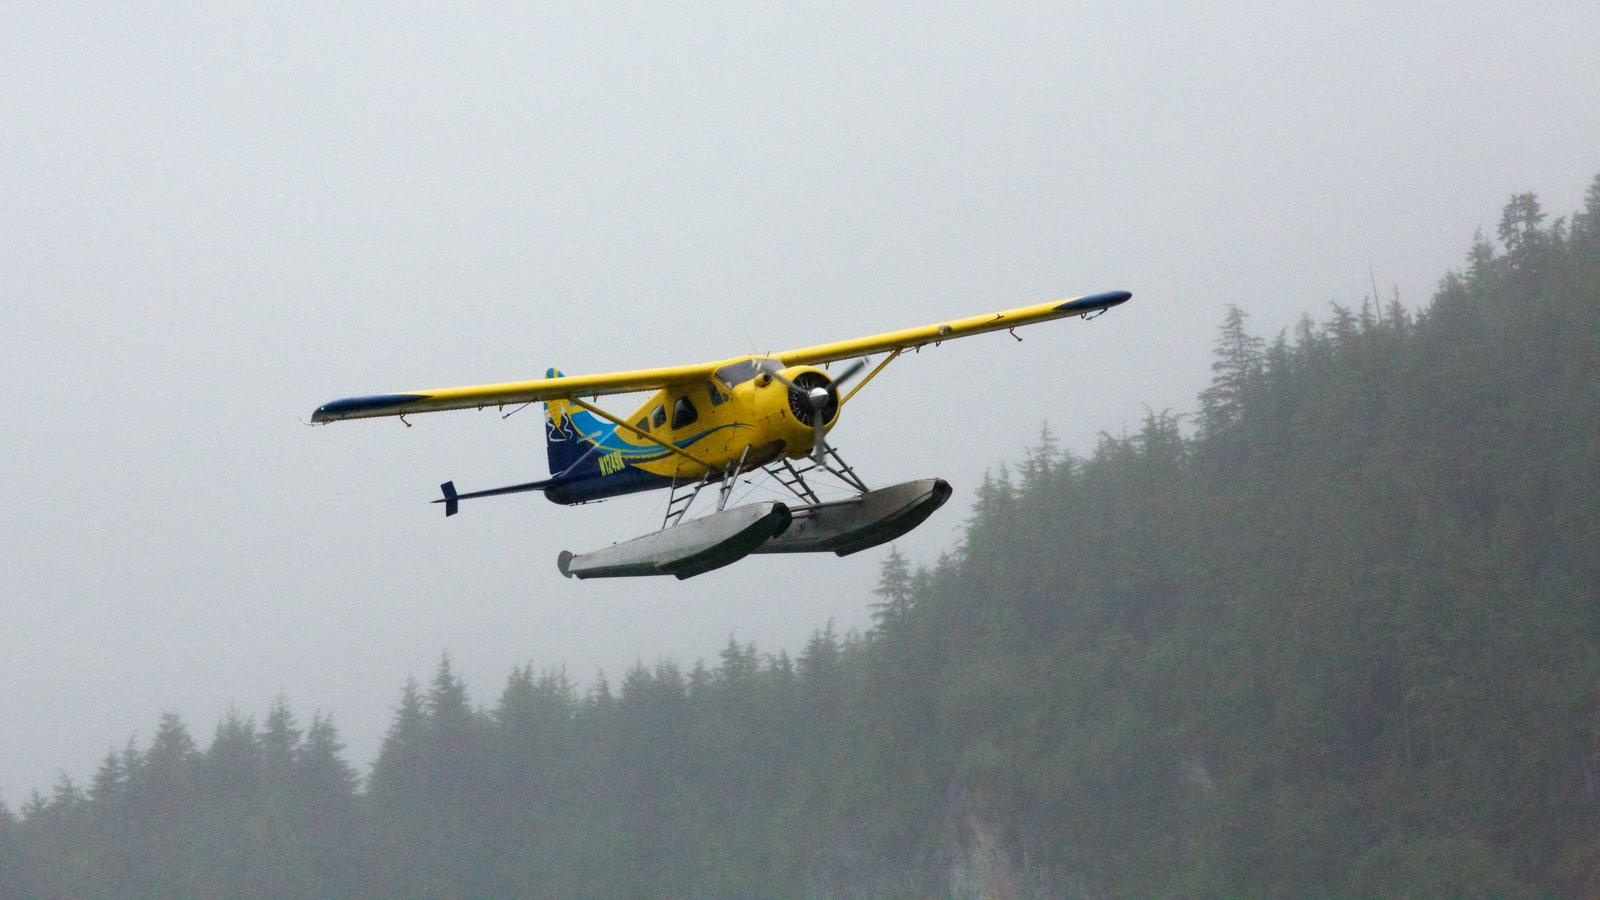 Ketchikan featuring aircraft and an aircraft